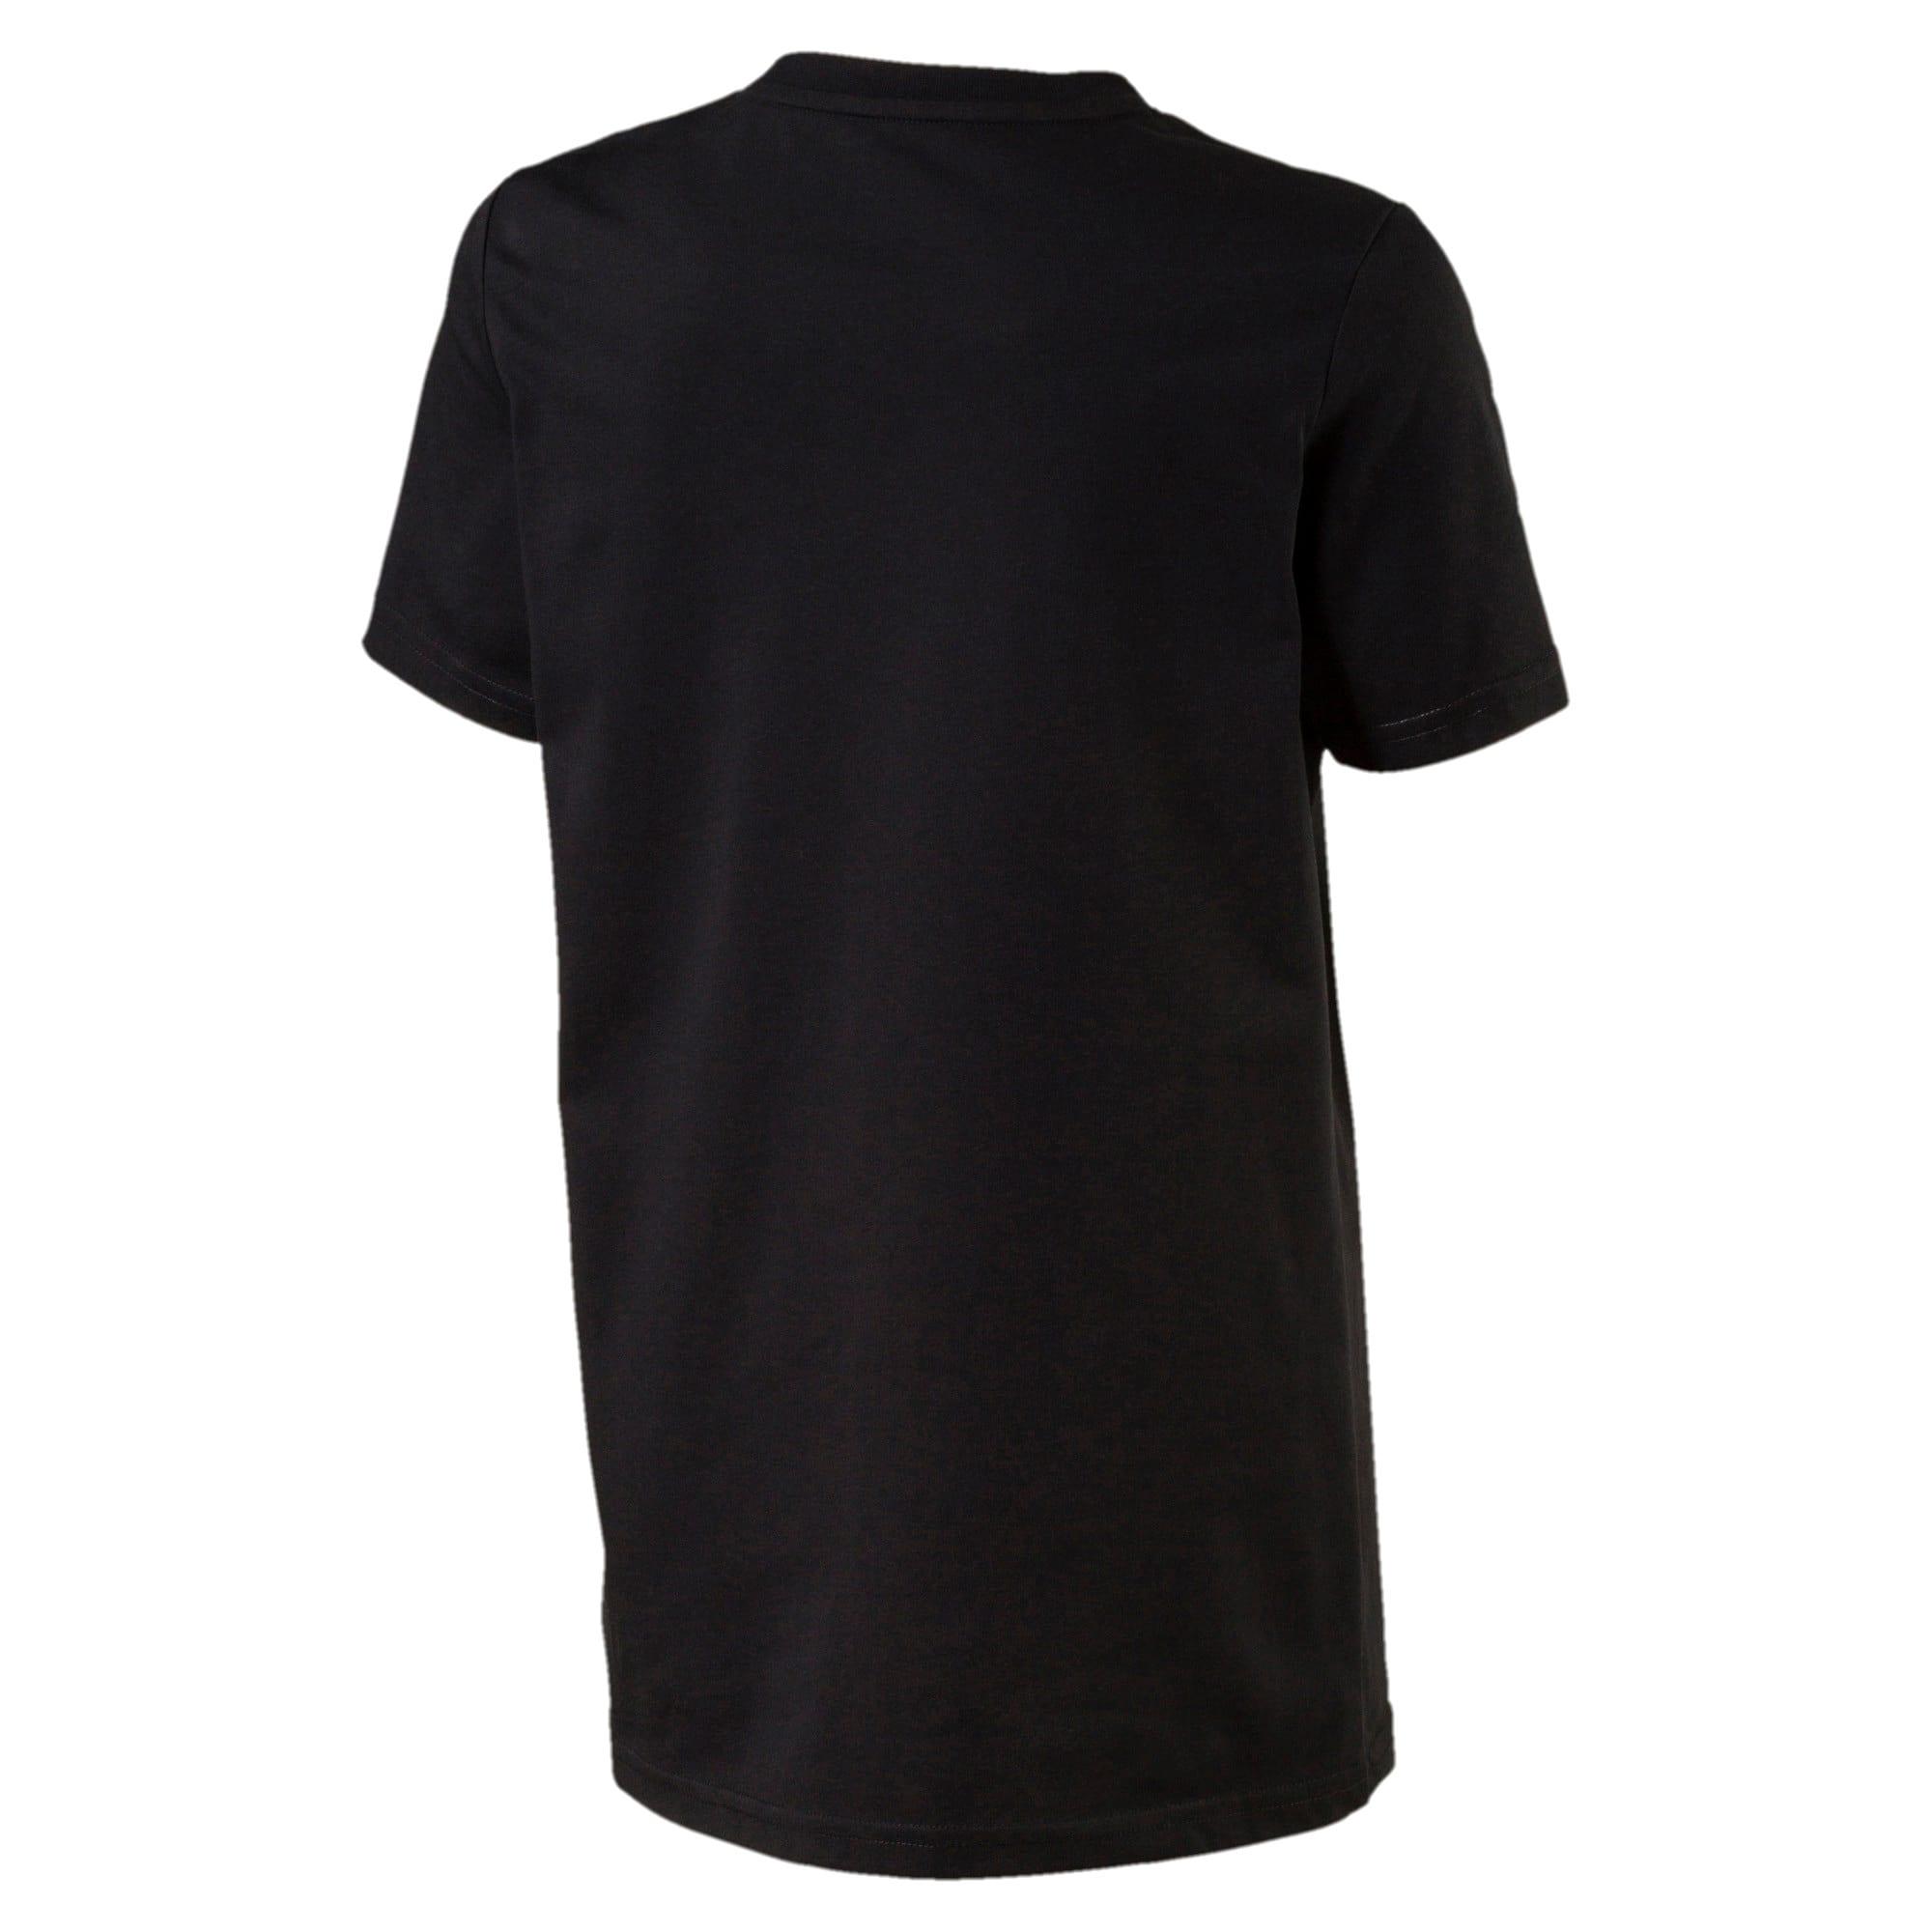 Thumbnail 2 of Boys' Evo Graphic T-Shirt, Cotton Black, medium-IND